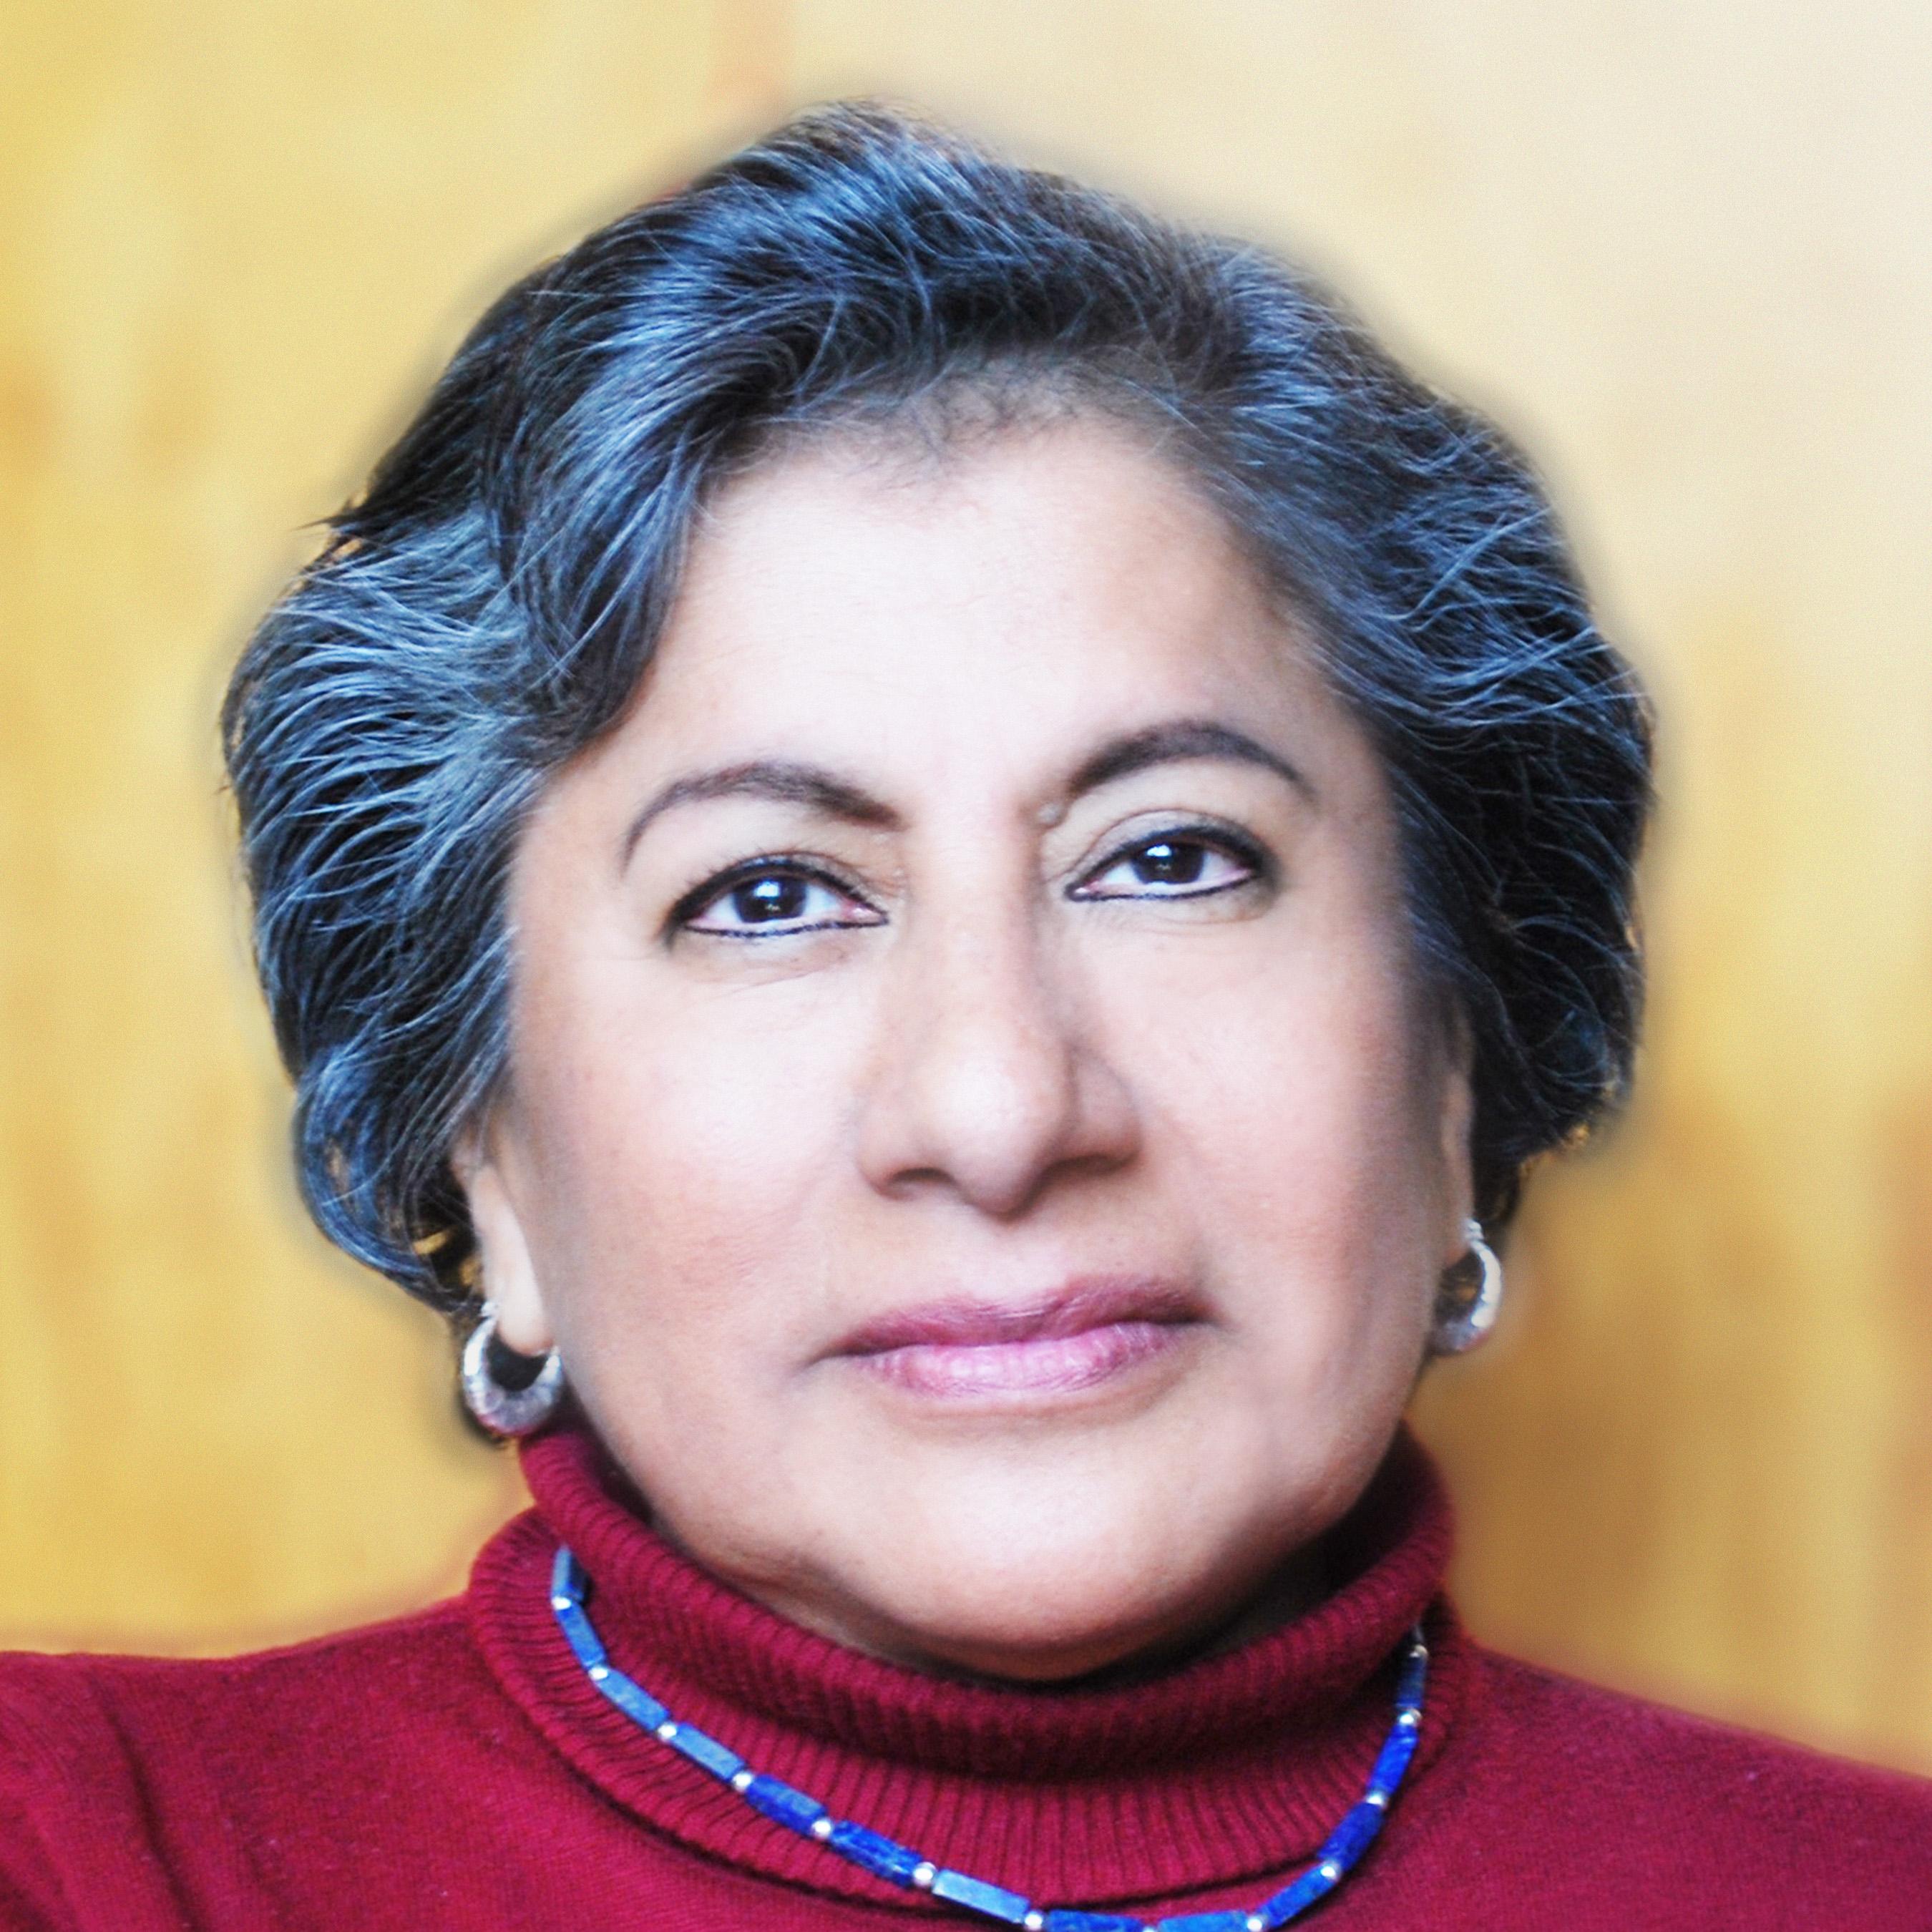 Dra. María Hilda Guadalupe Reyes Zapata